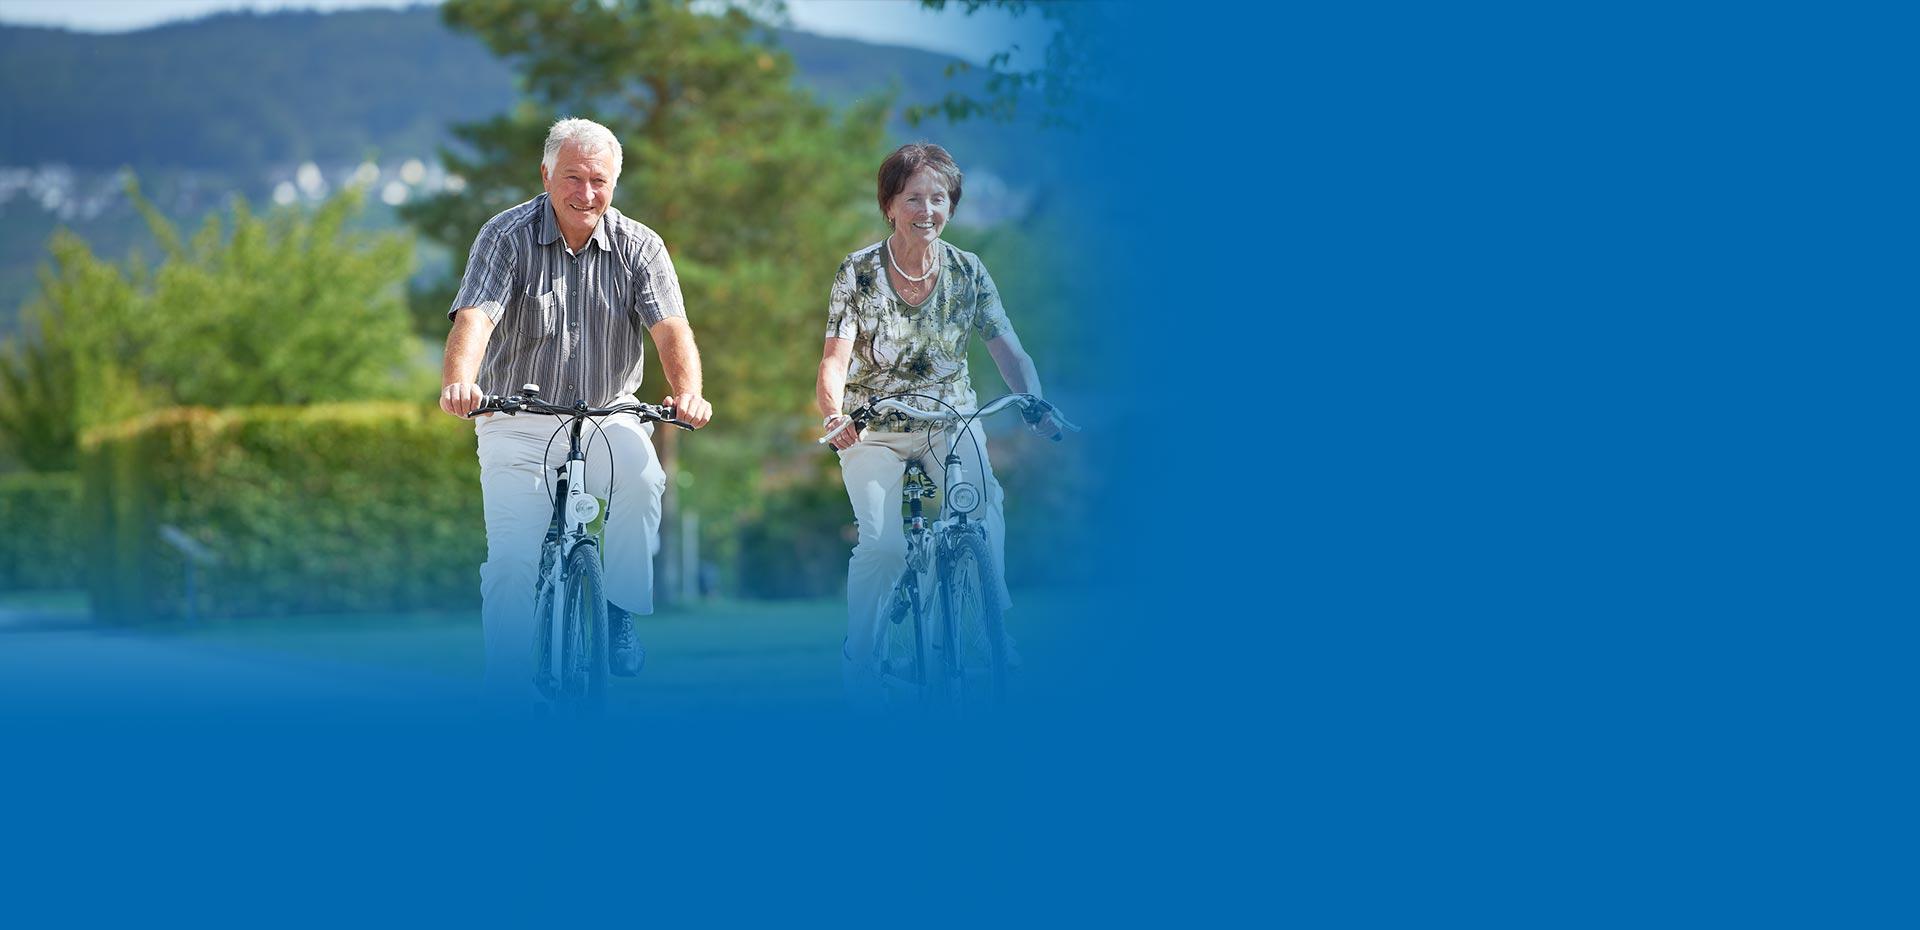 Ältere Frau und älterer Mann fahren vergnügt Fahrrad